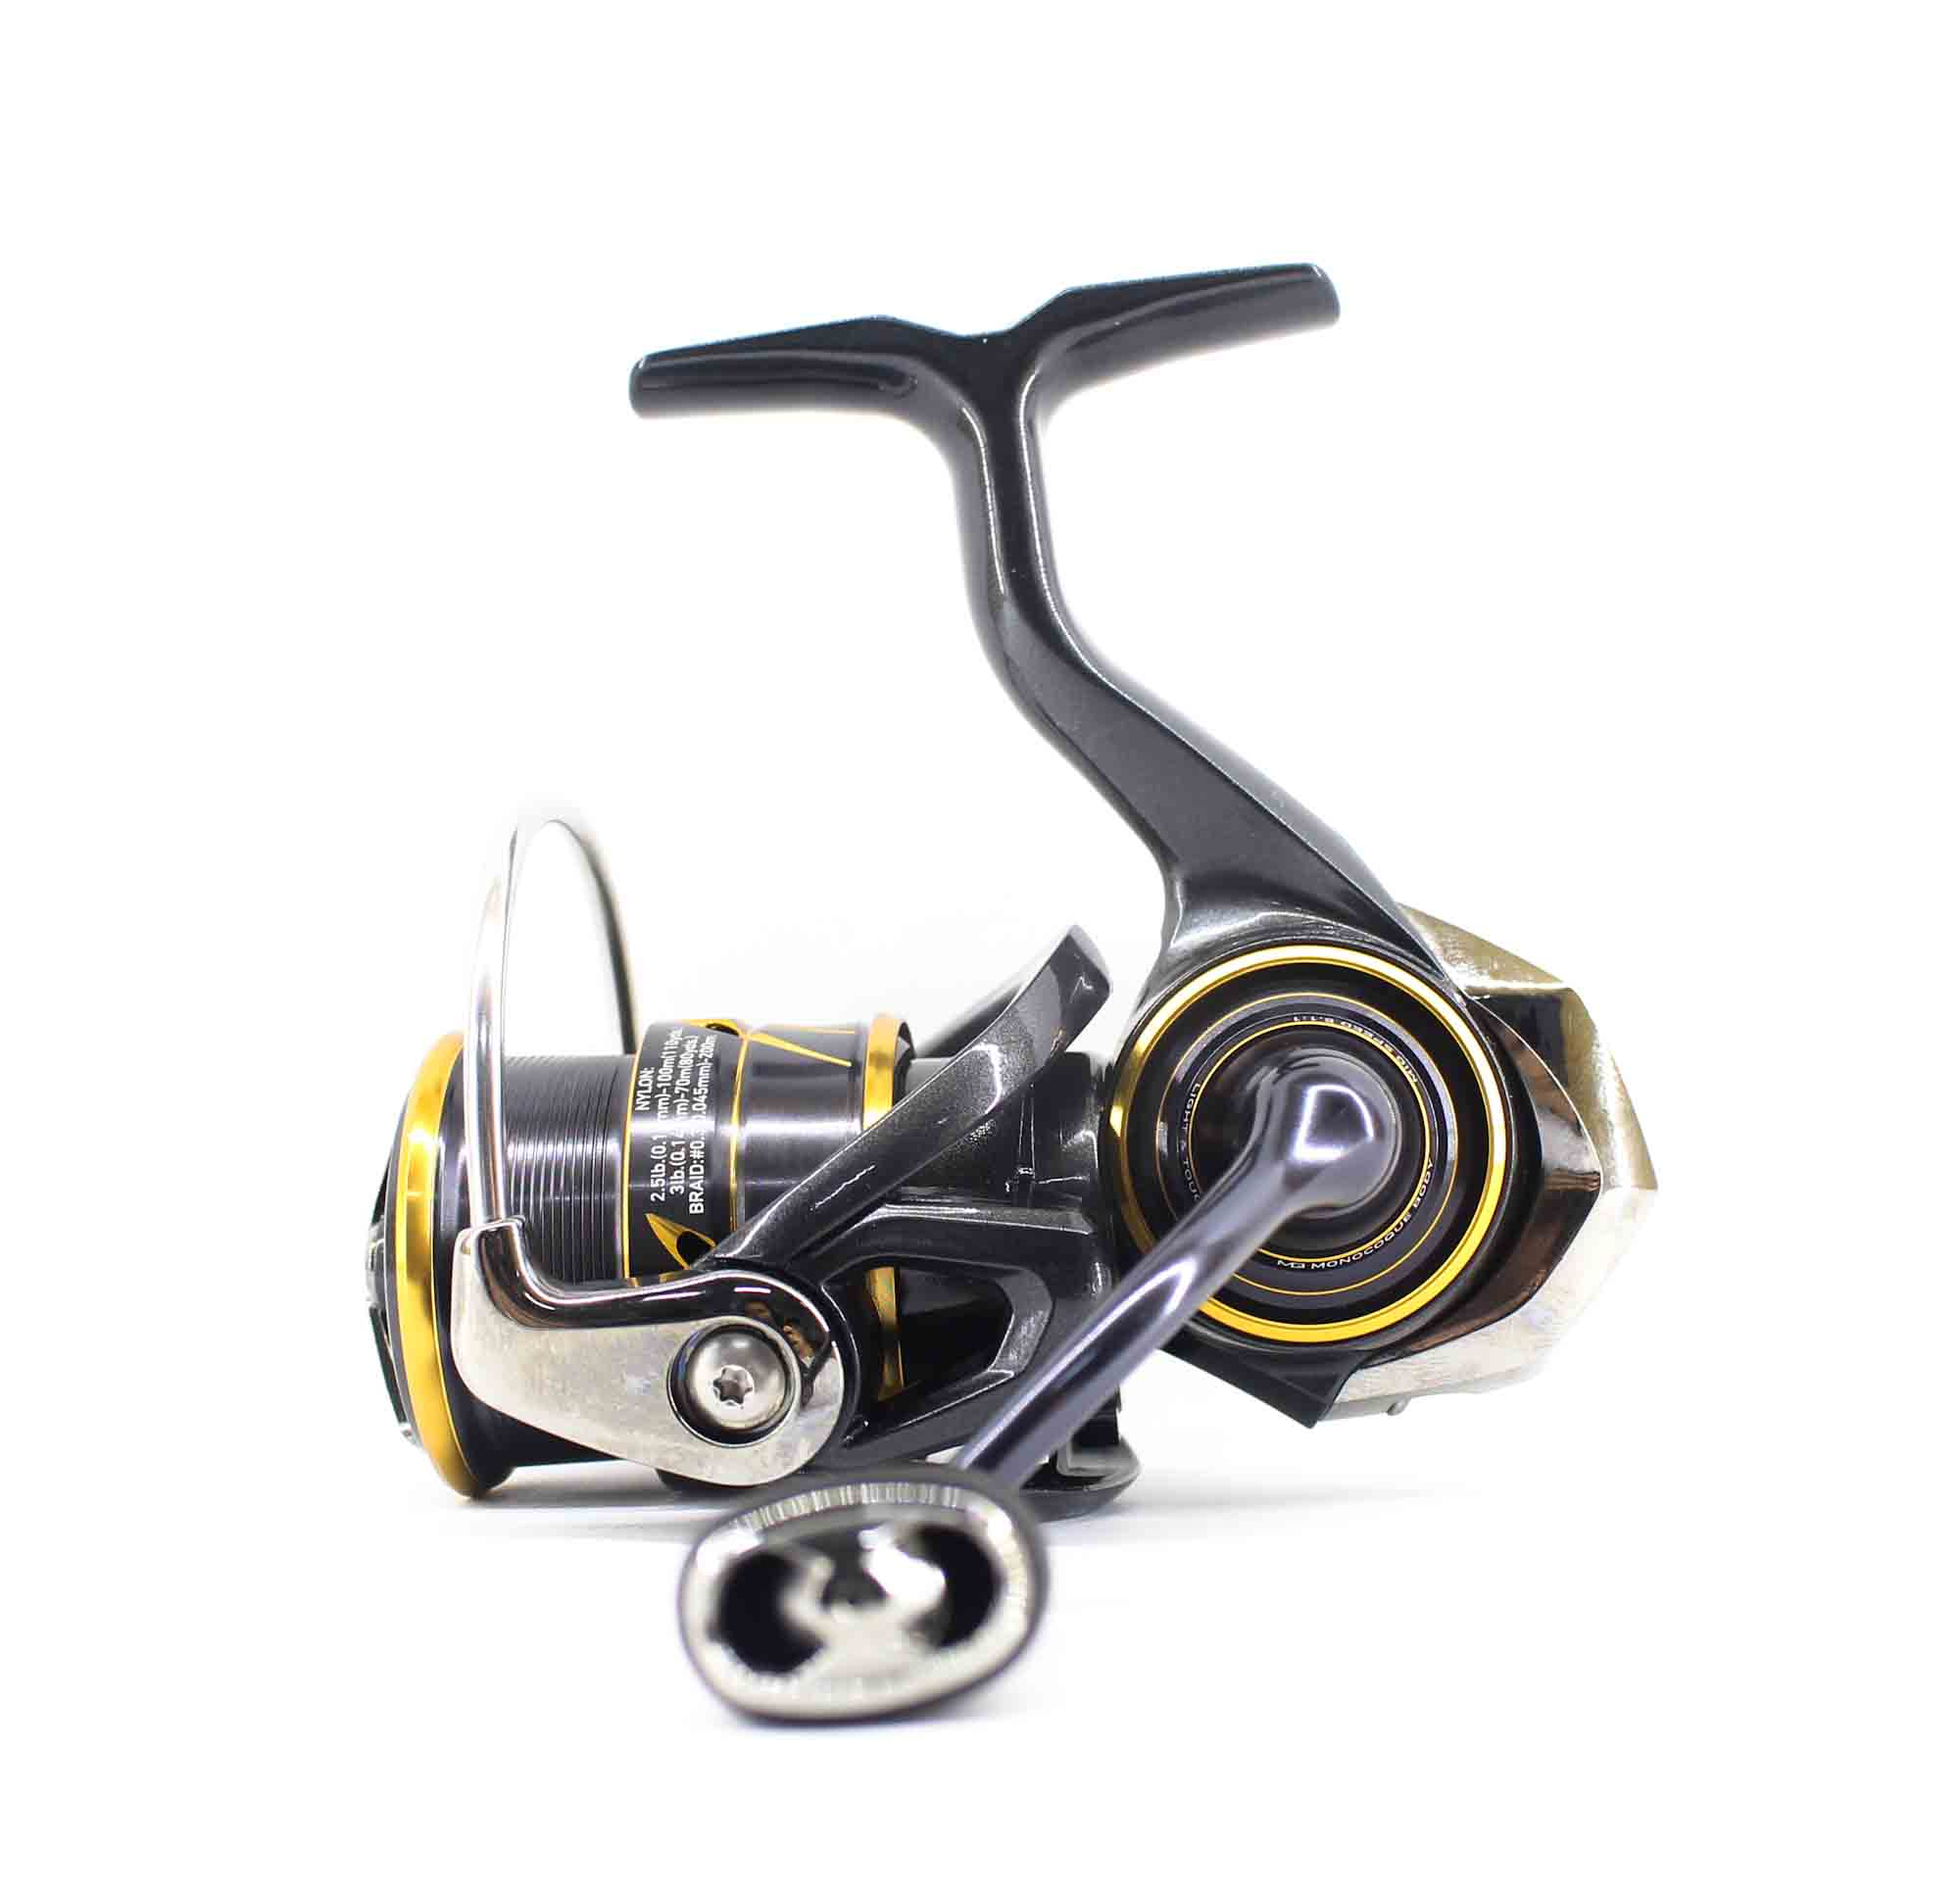 Daiwa Reel Spinning 21 Caldia FC LT1000S (3121)